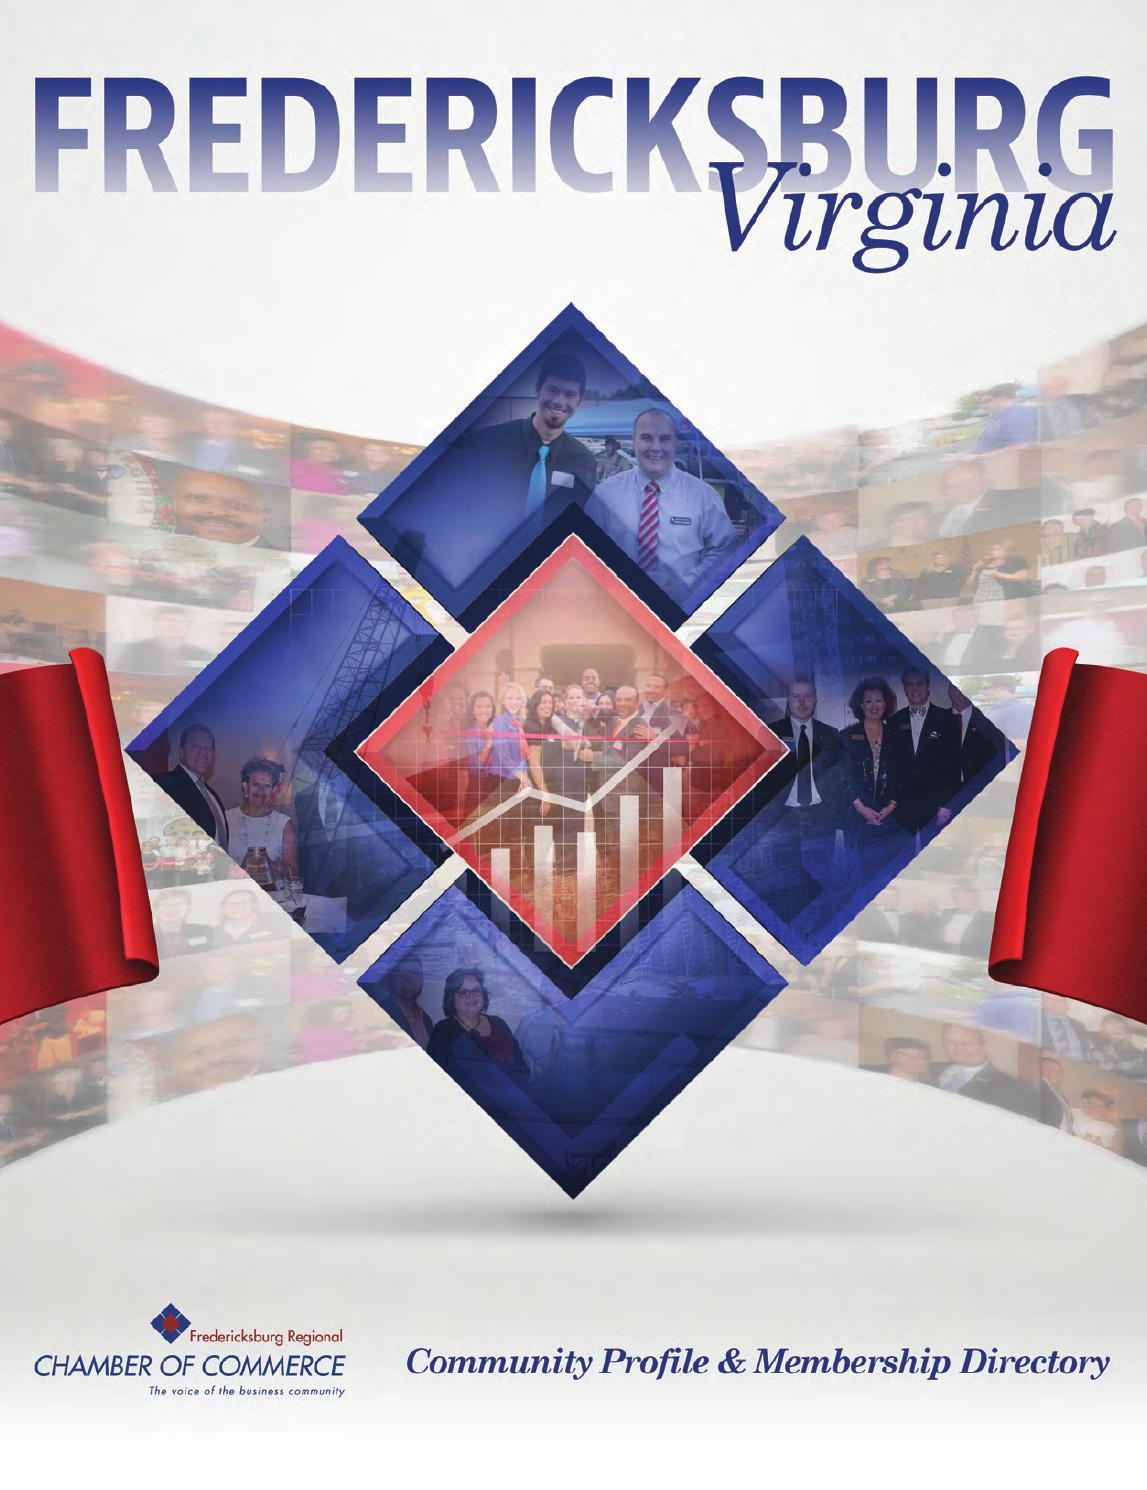 Fredericksburg VA 2015 Community Profile And Membership Directory By CommunityLink